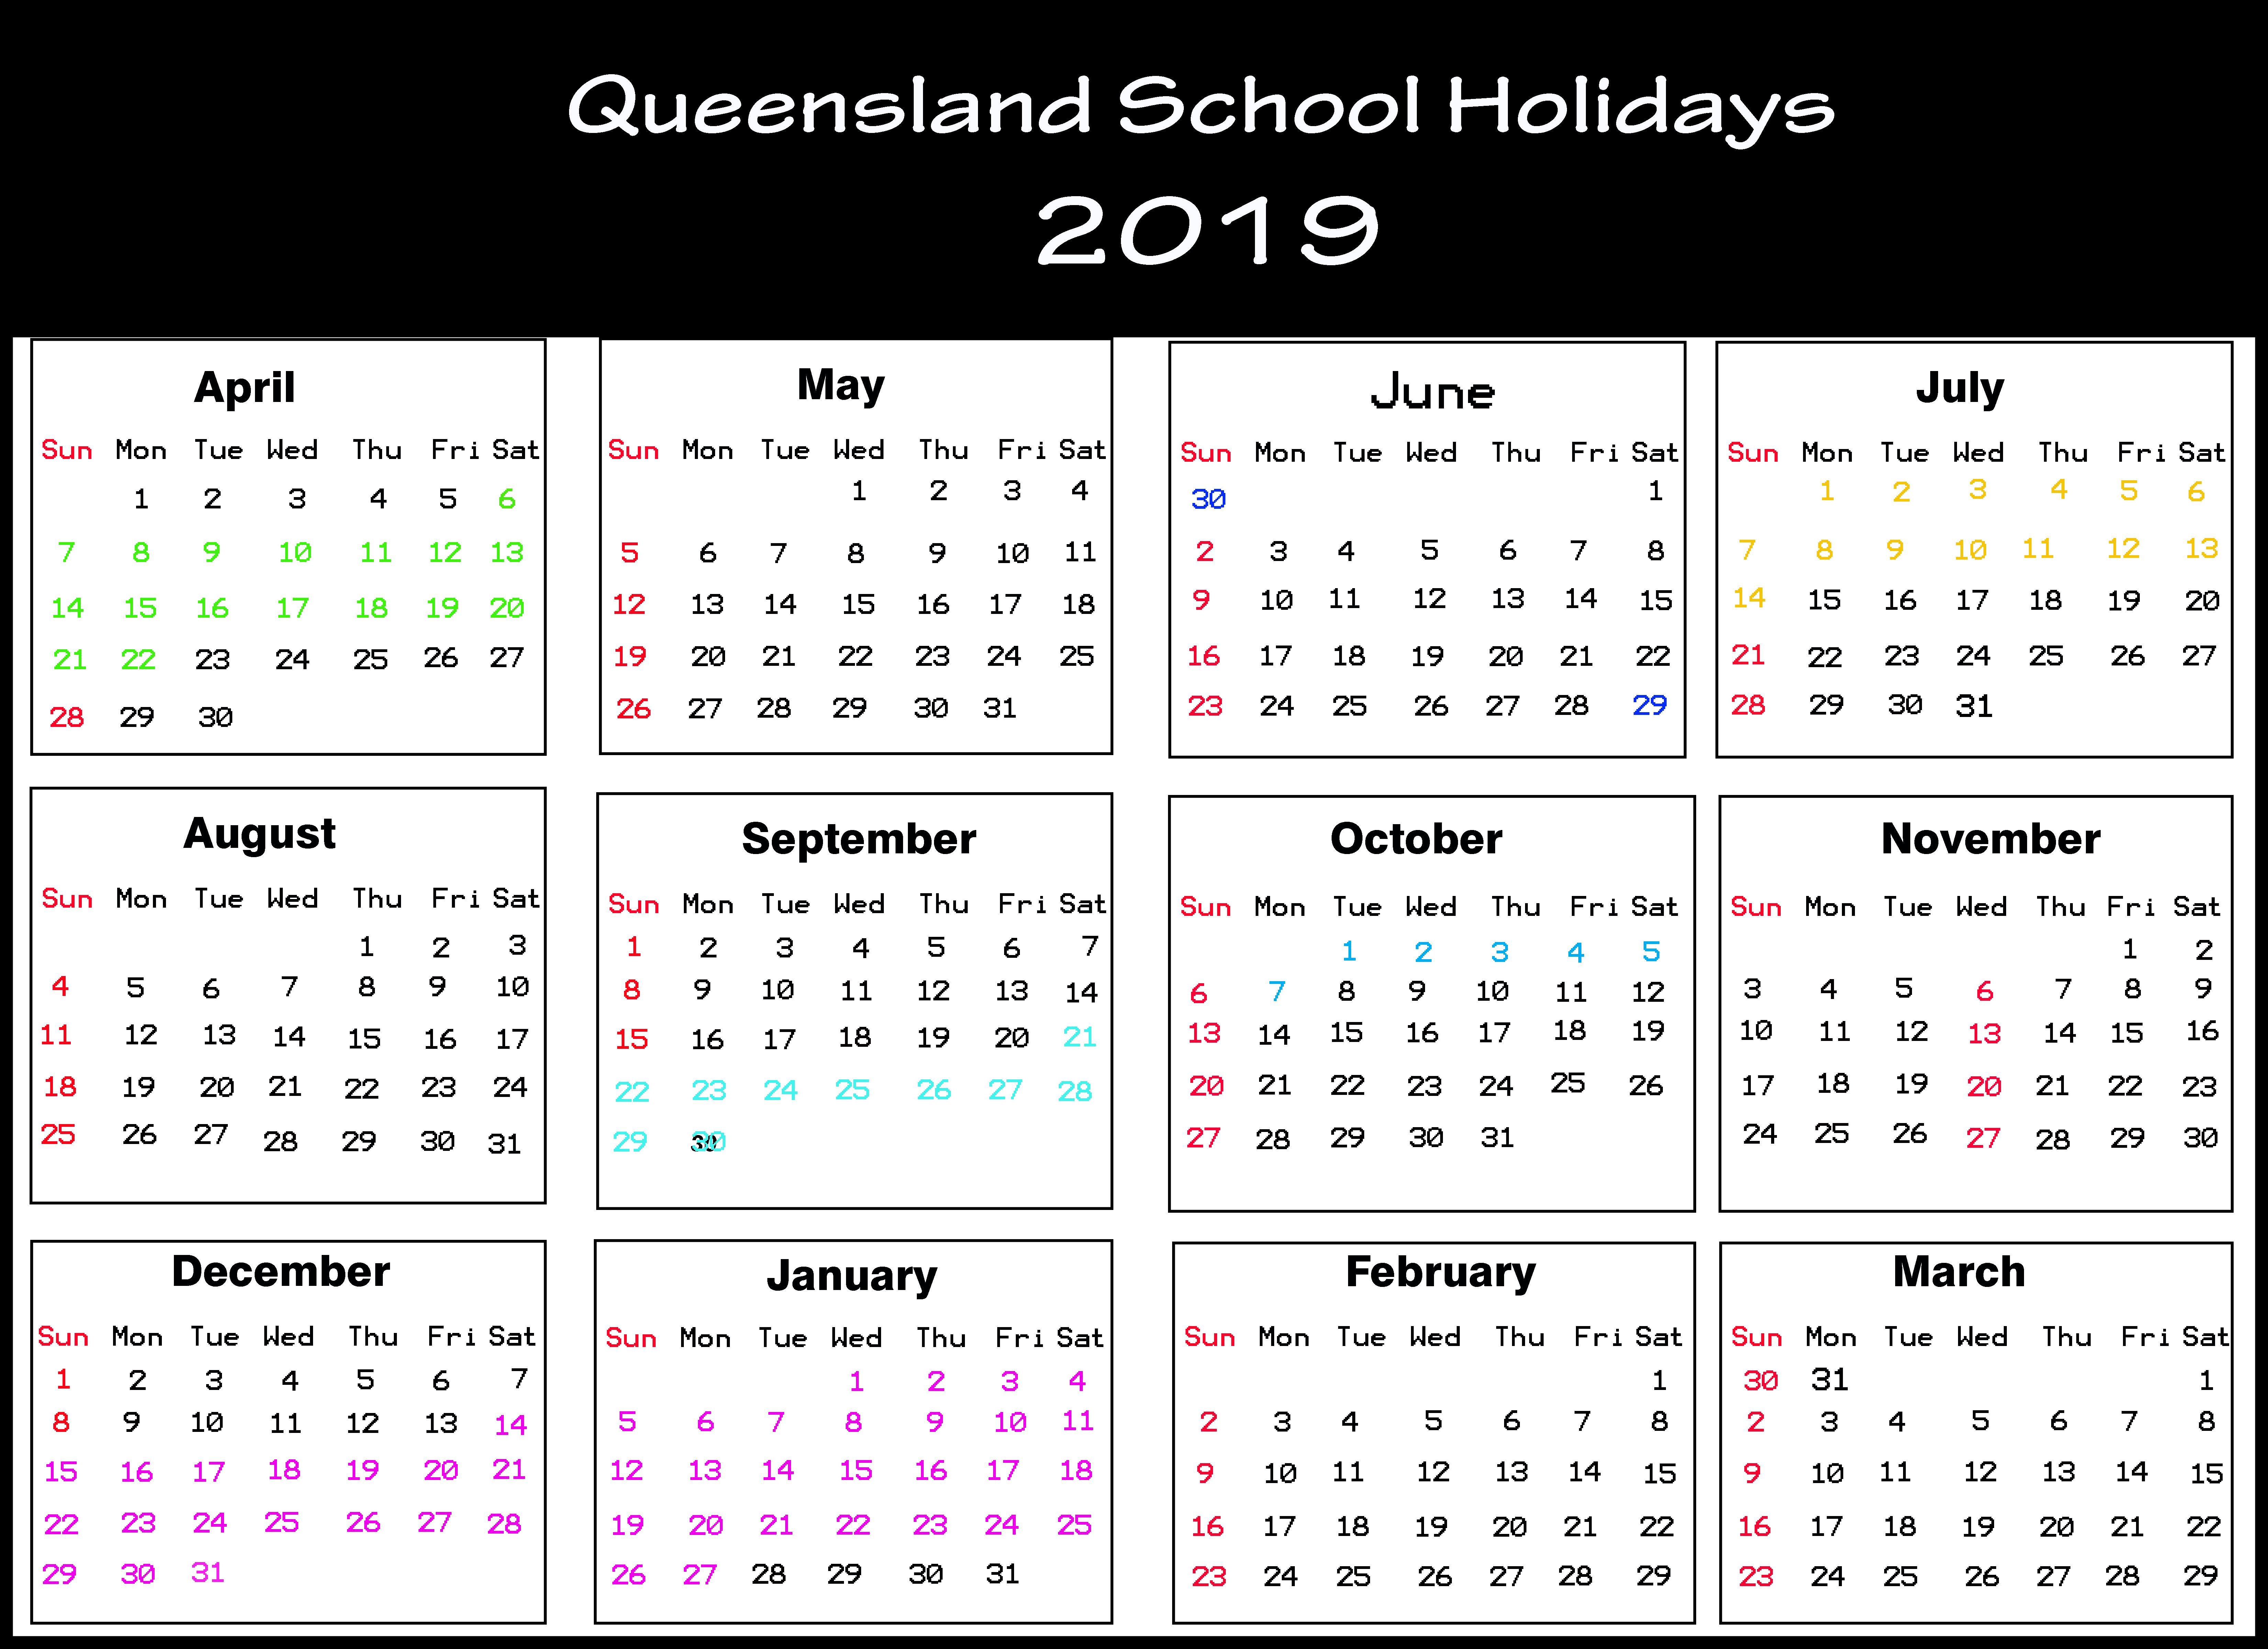 Qld School Calendar 2019 | Queensland (Qld) School Holidays with regard to 2020 Qld School Calendar Printable